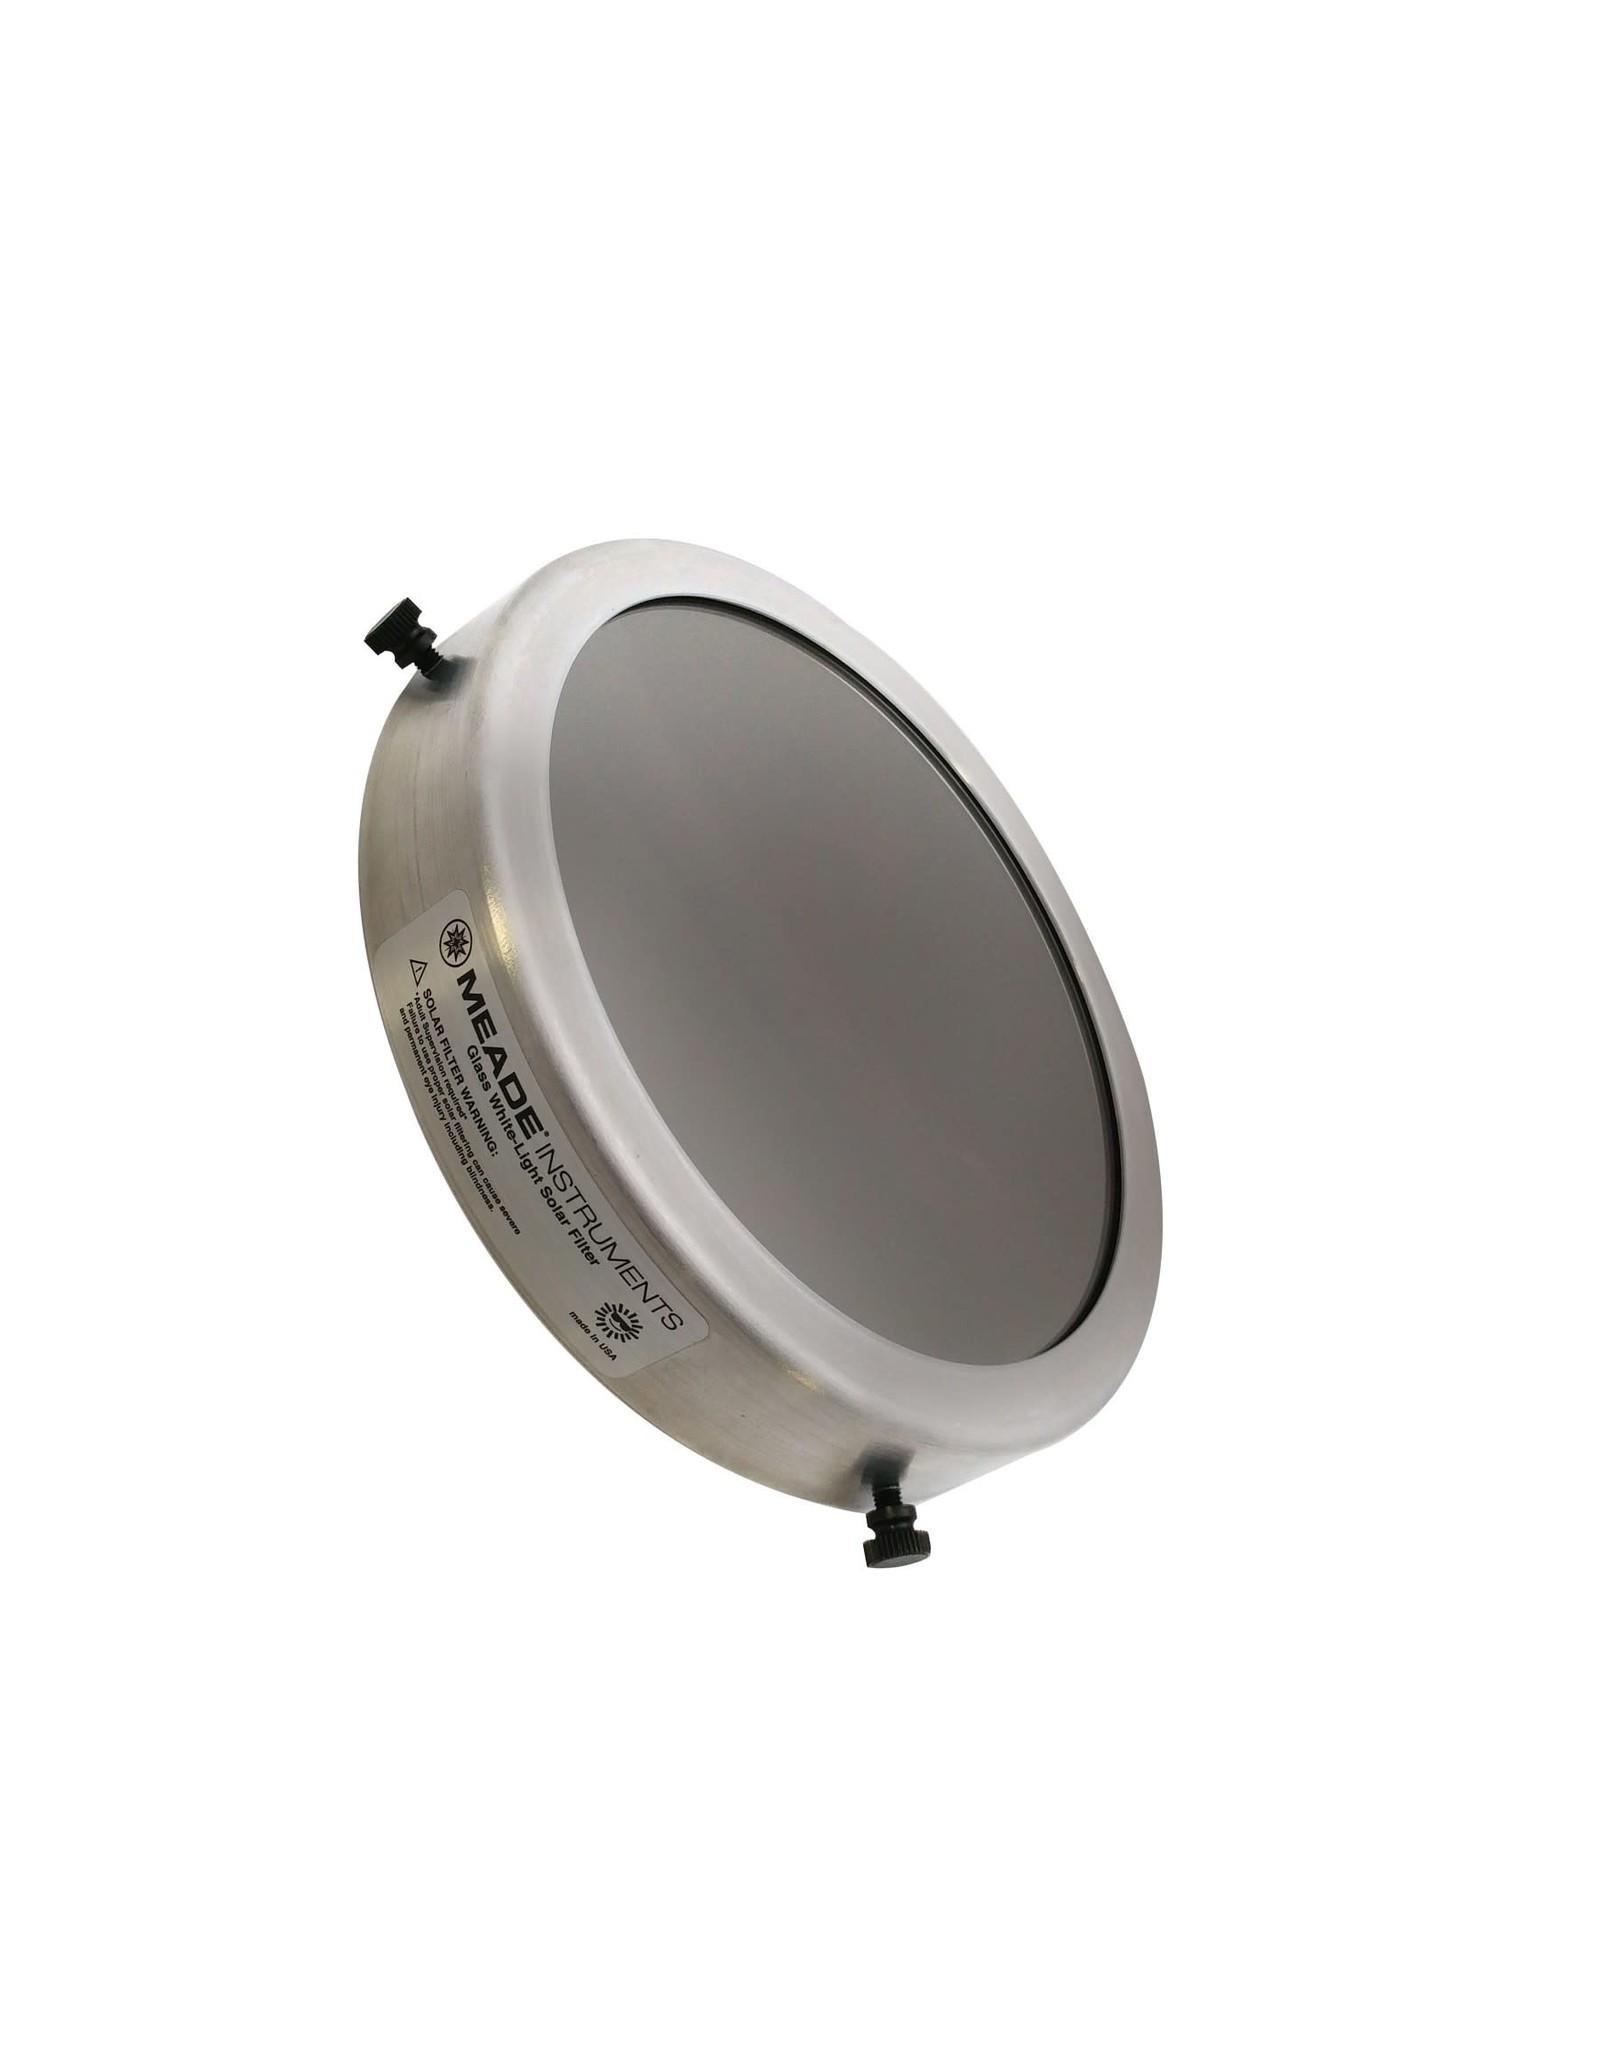 Meade Meade Glass White-Light Solar Filter #575 (ID 146mm)